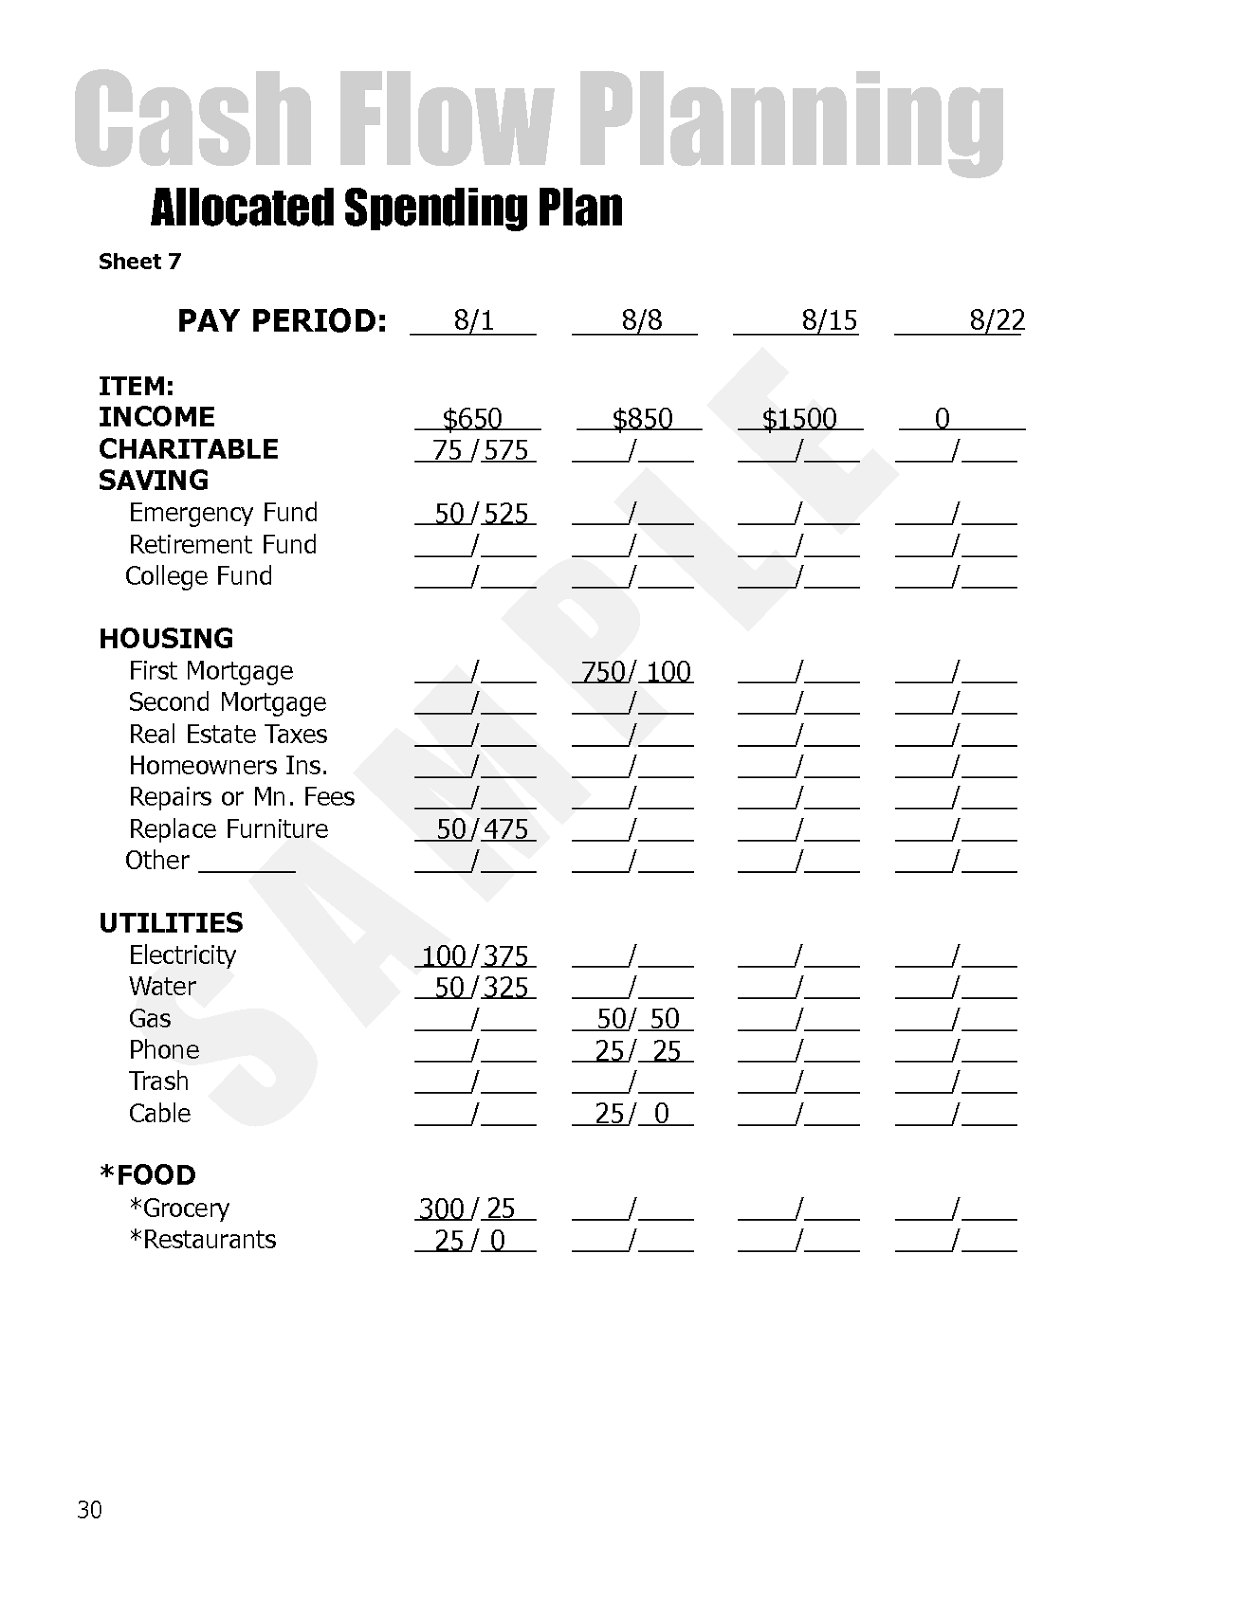 Dave Ramsey Allocated Spending Plan 1 245 1 600 Pixels